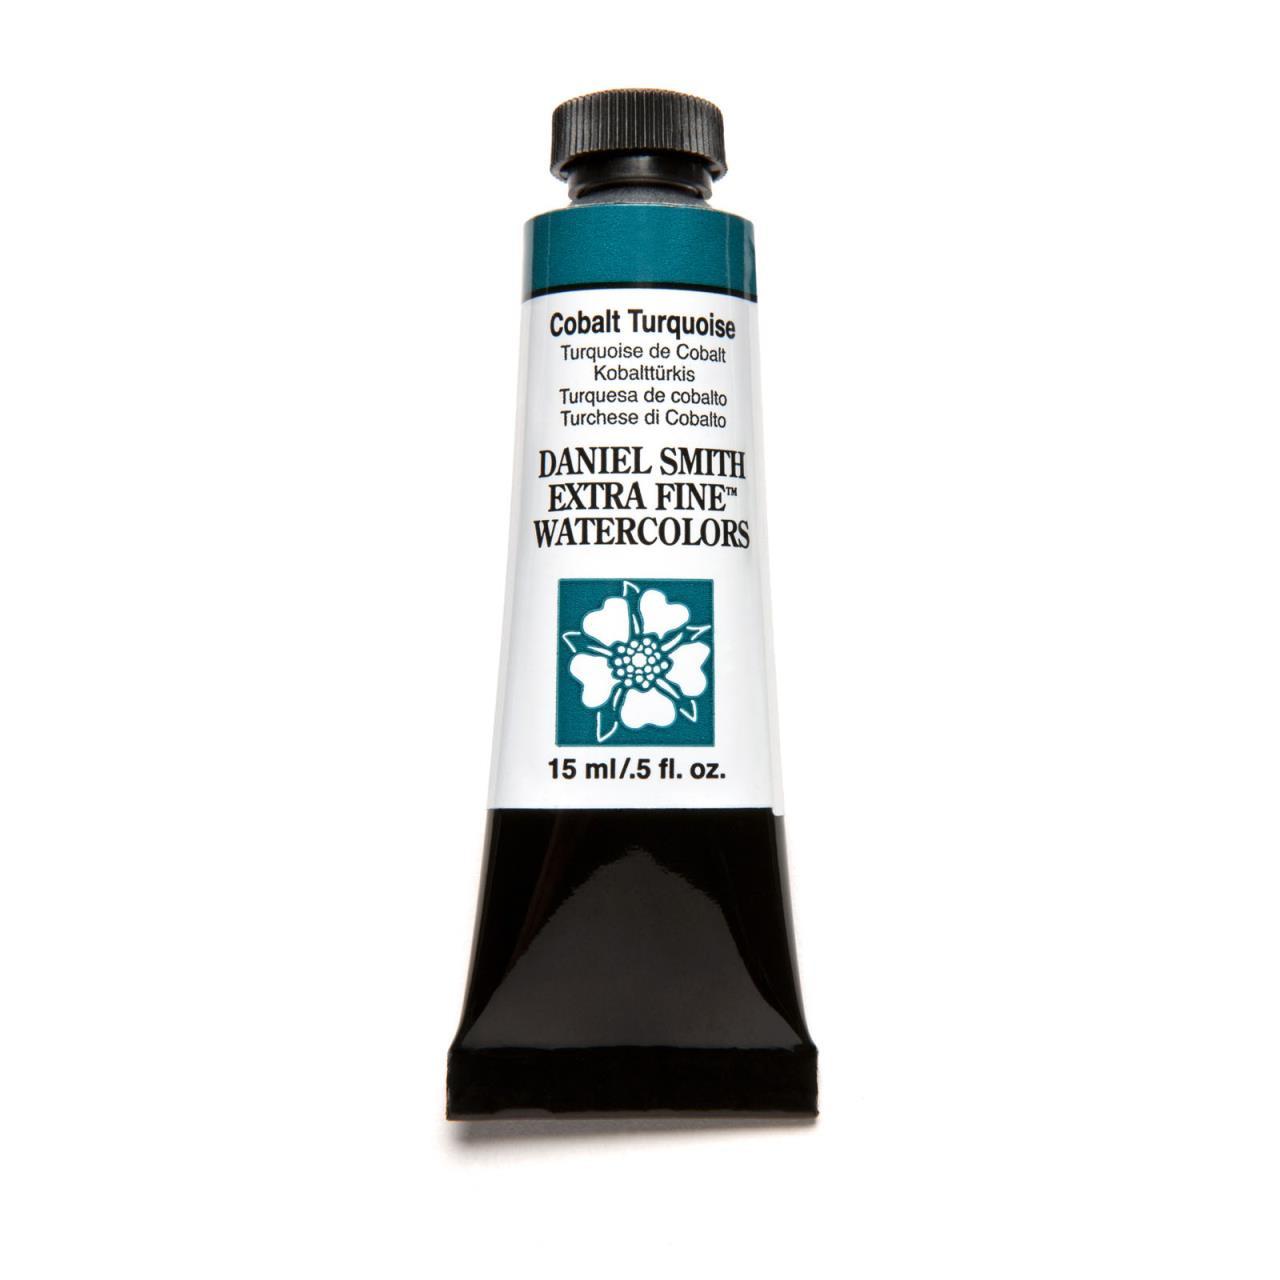 Cobalt Turquoise, DANIEL SMITH Extra Fine Watercolors 15ml Tubes -